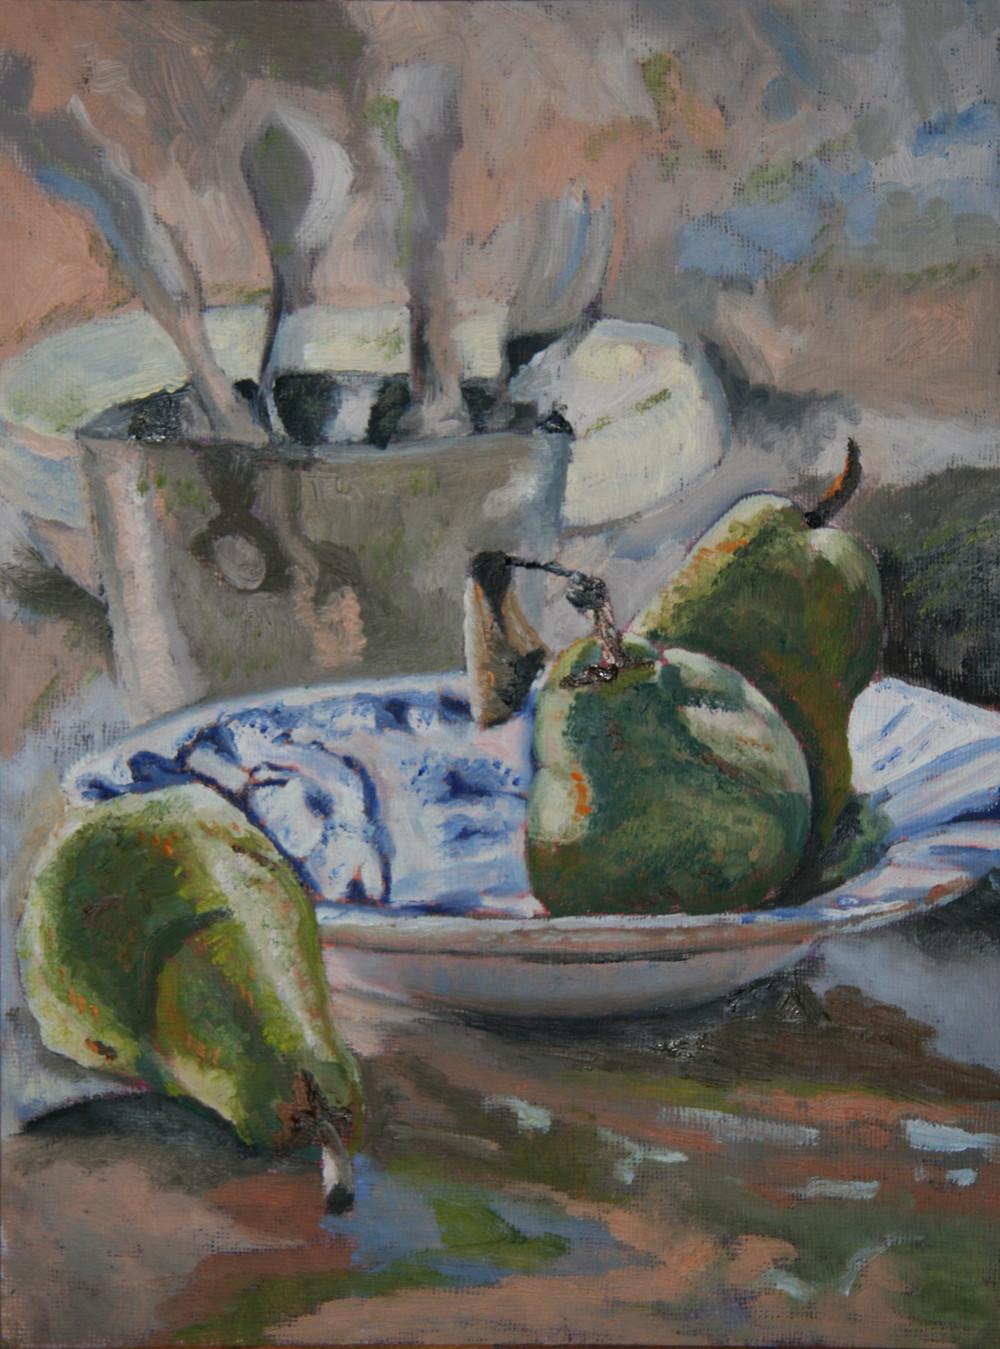 Porcelain Pears